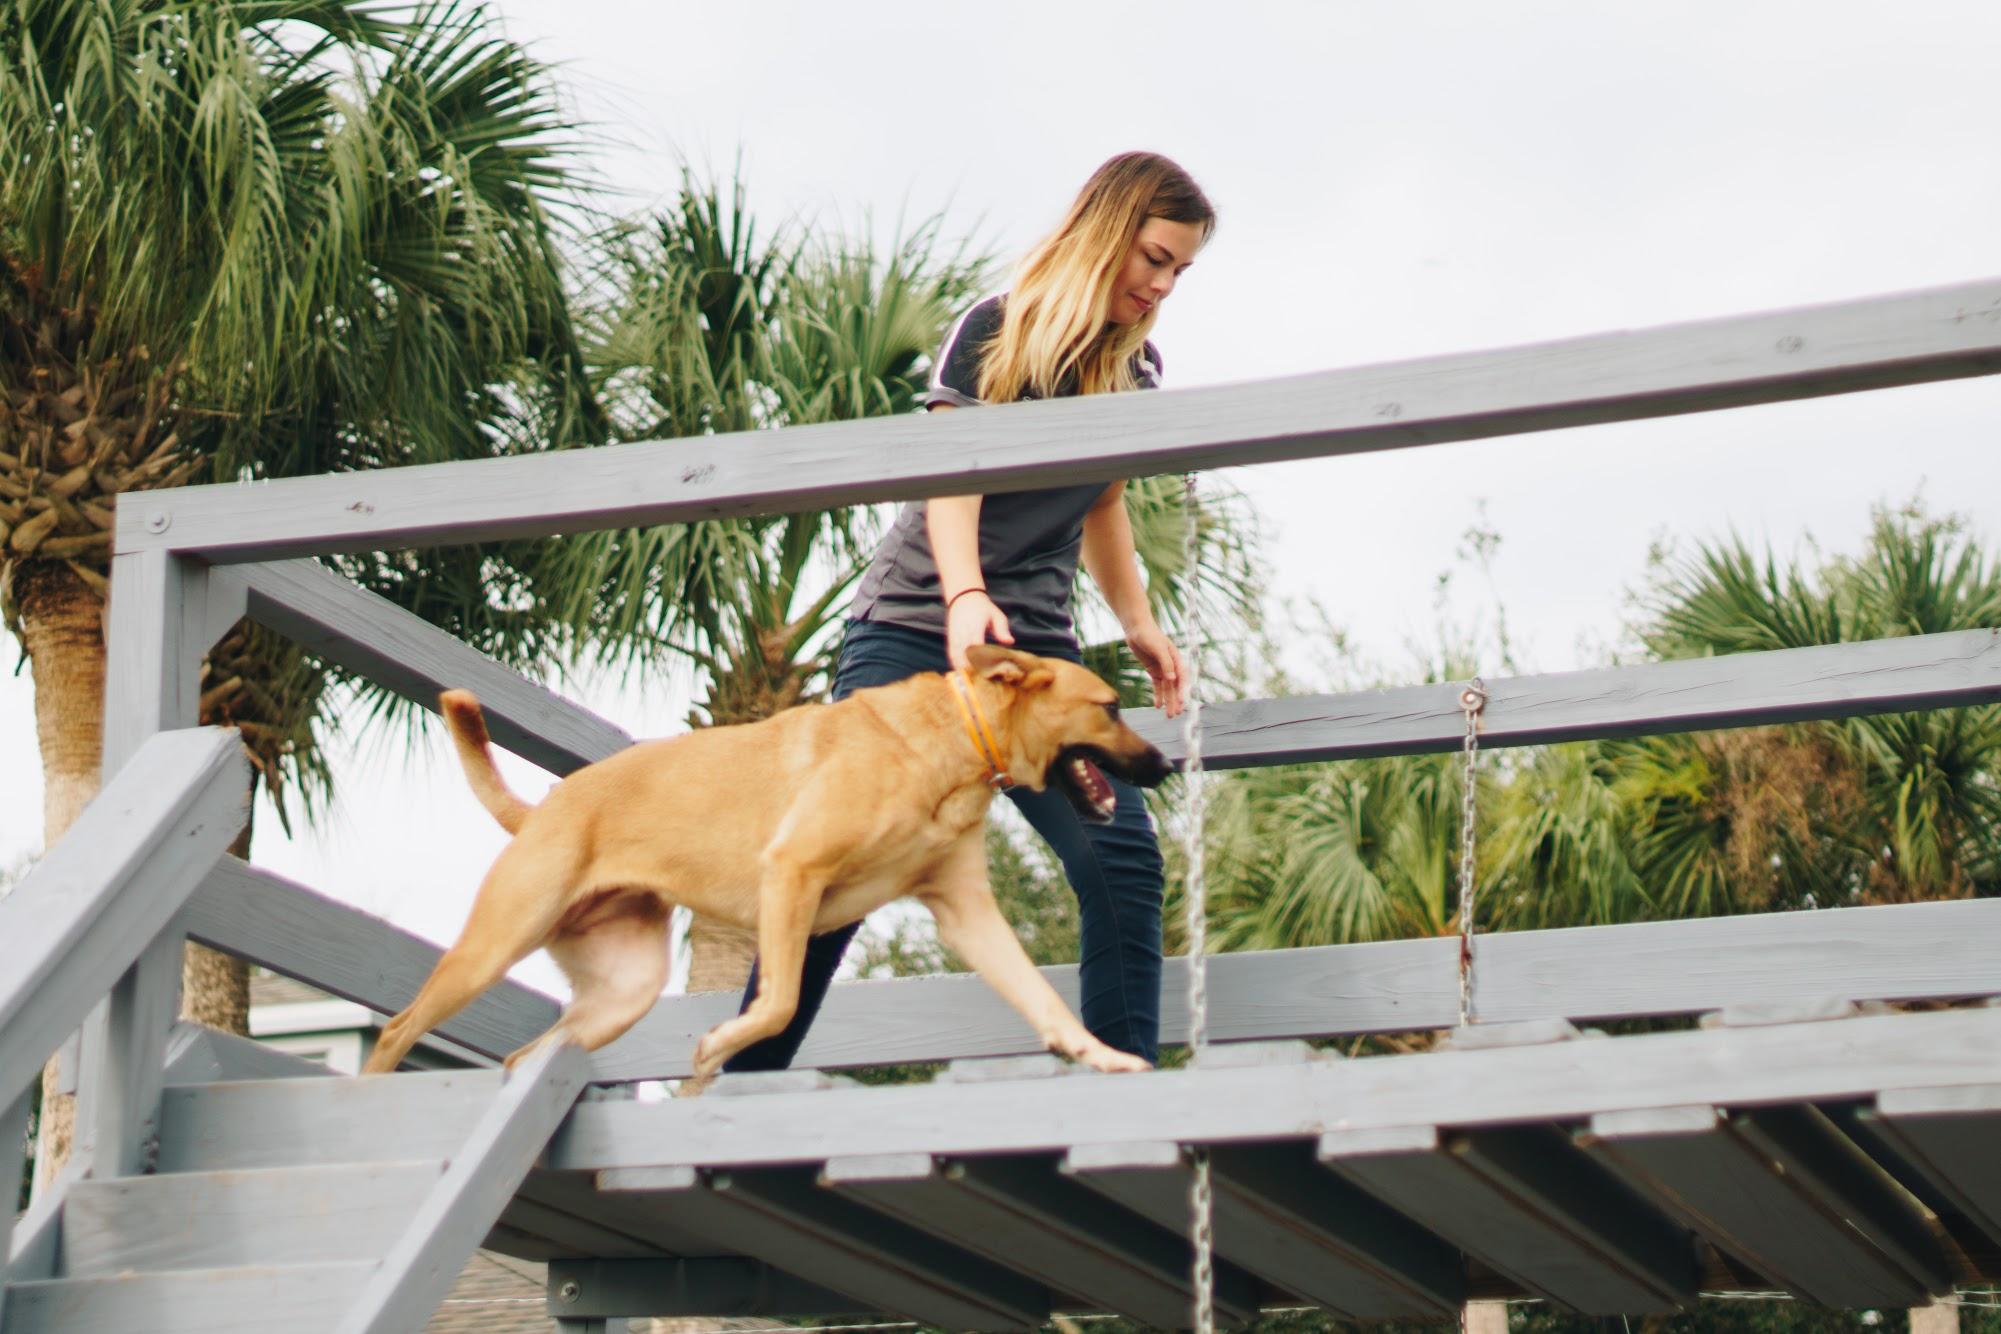 K-9 school dog training center